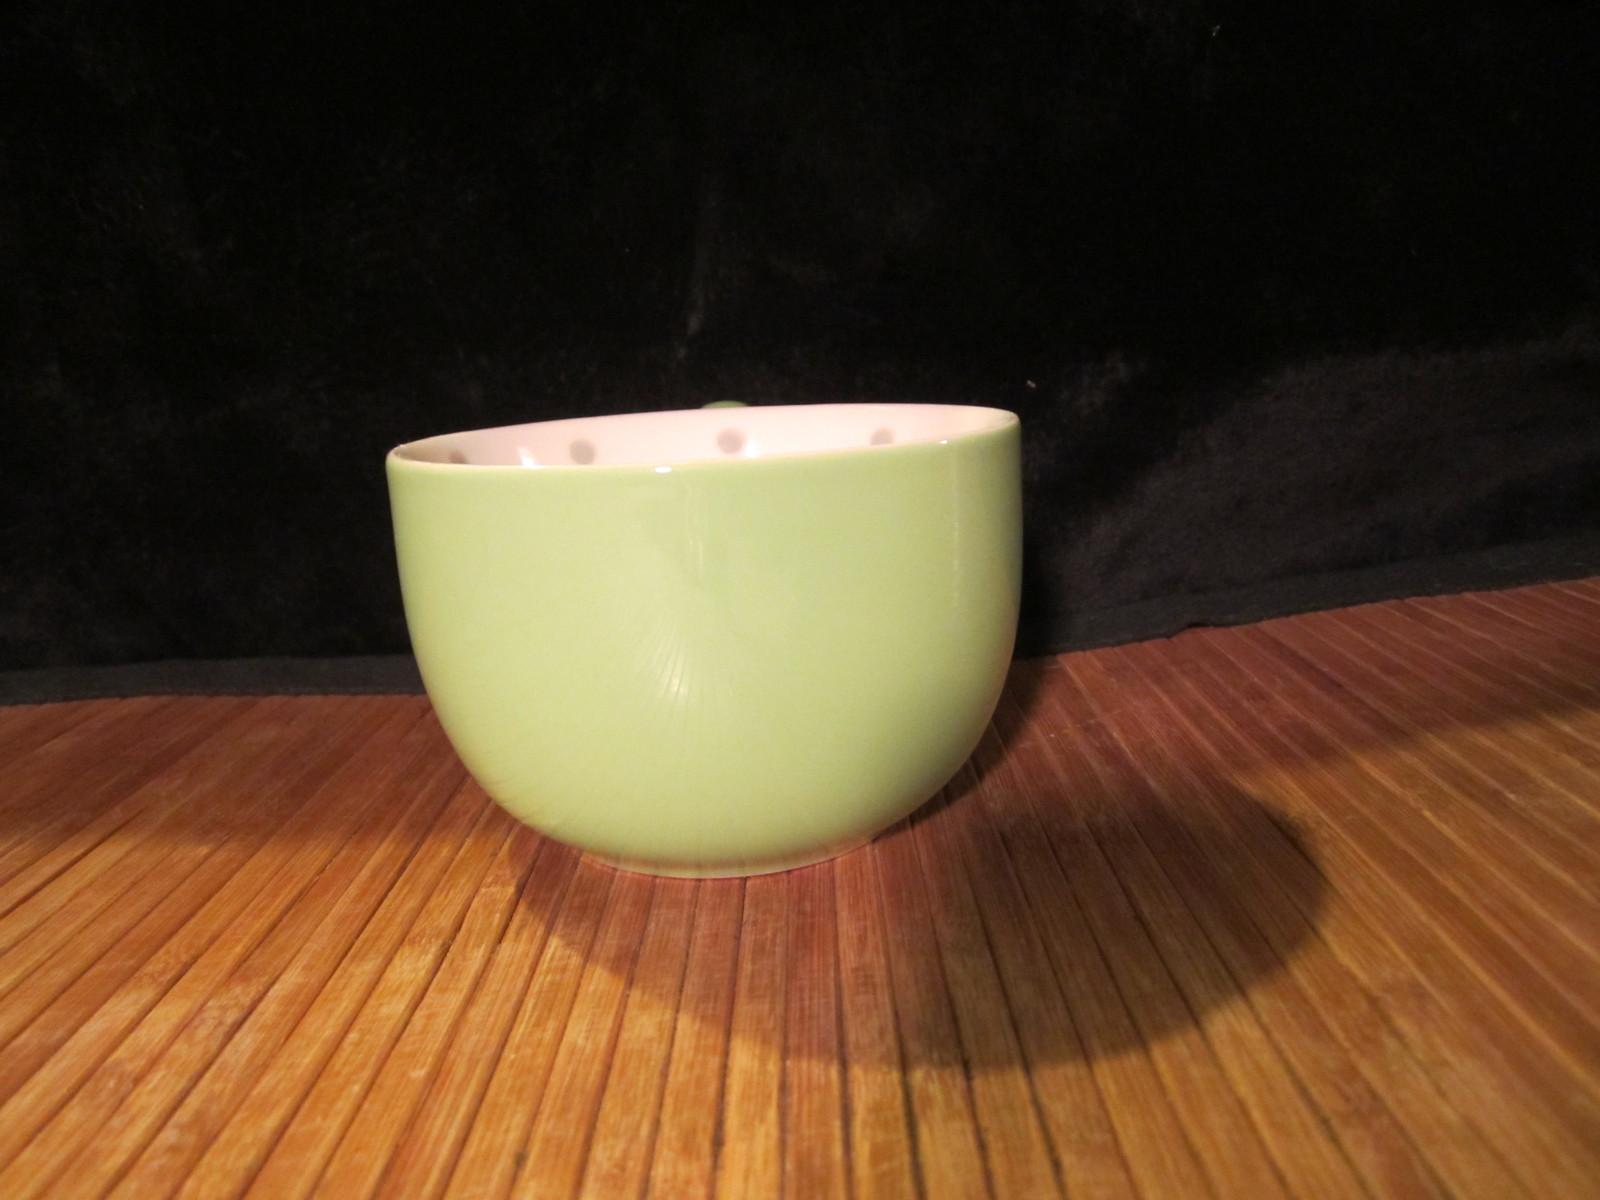 2005 Starbucks Light Green Coffee Mug Tea Cup Grey Polka Dots/Pink Flower Inside